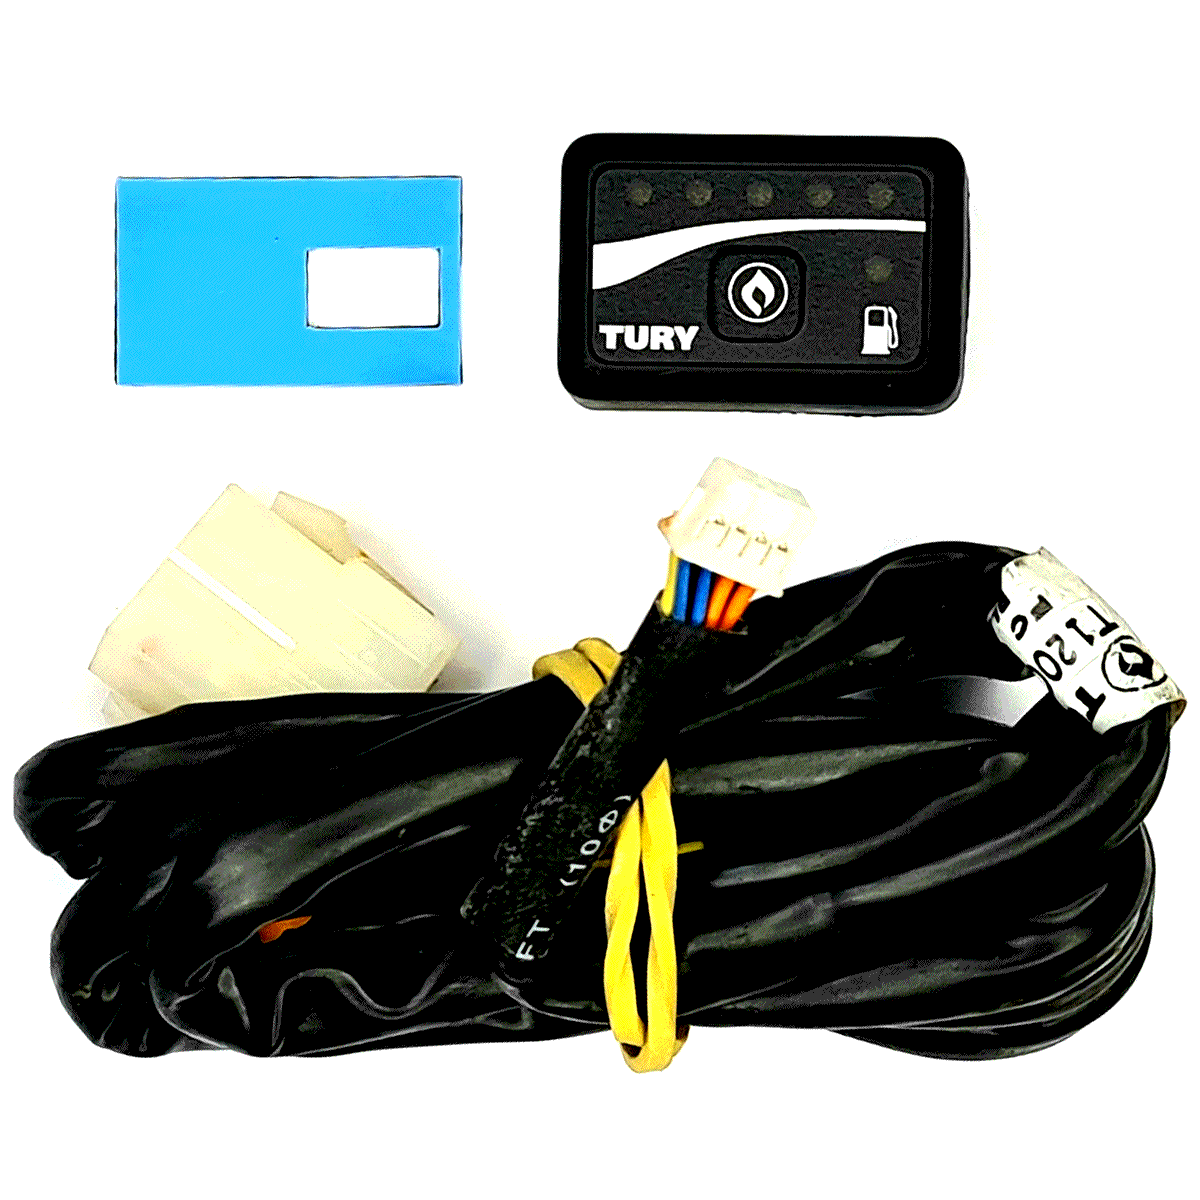 T1200 REPAIR - Microcomutadora T1200 e Adaptador para chicote T1000